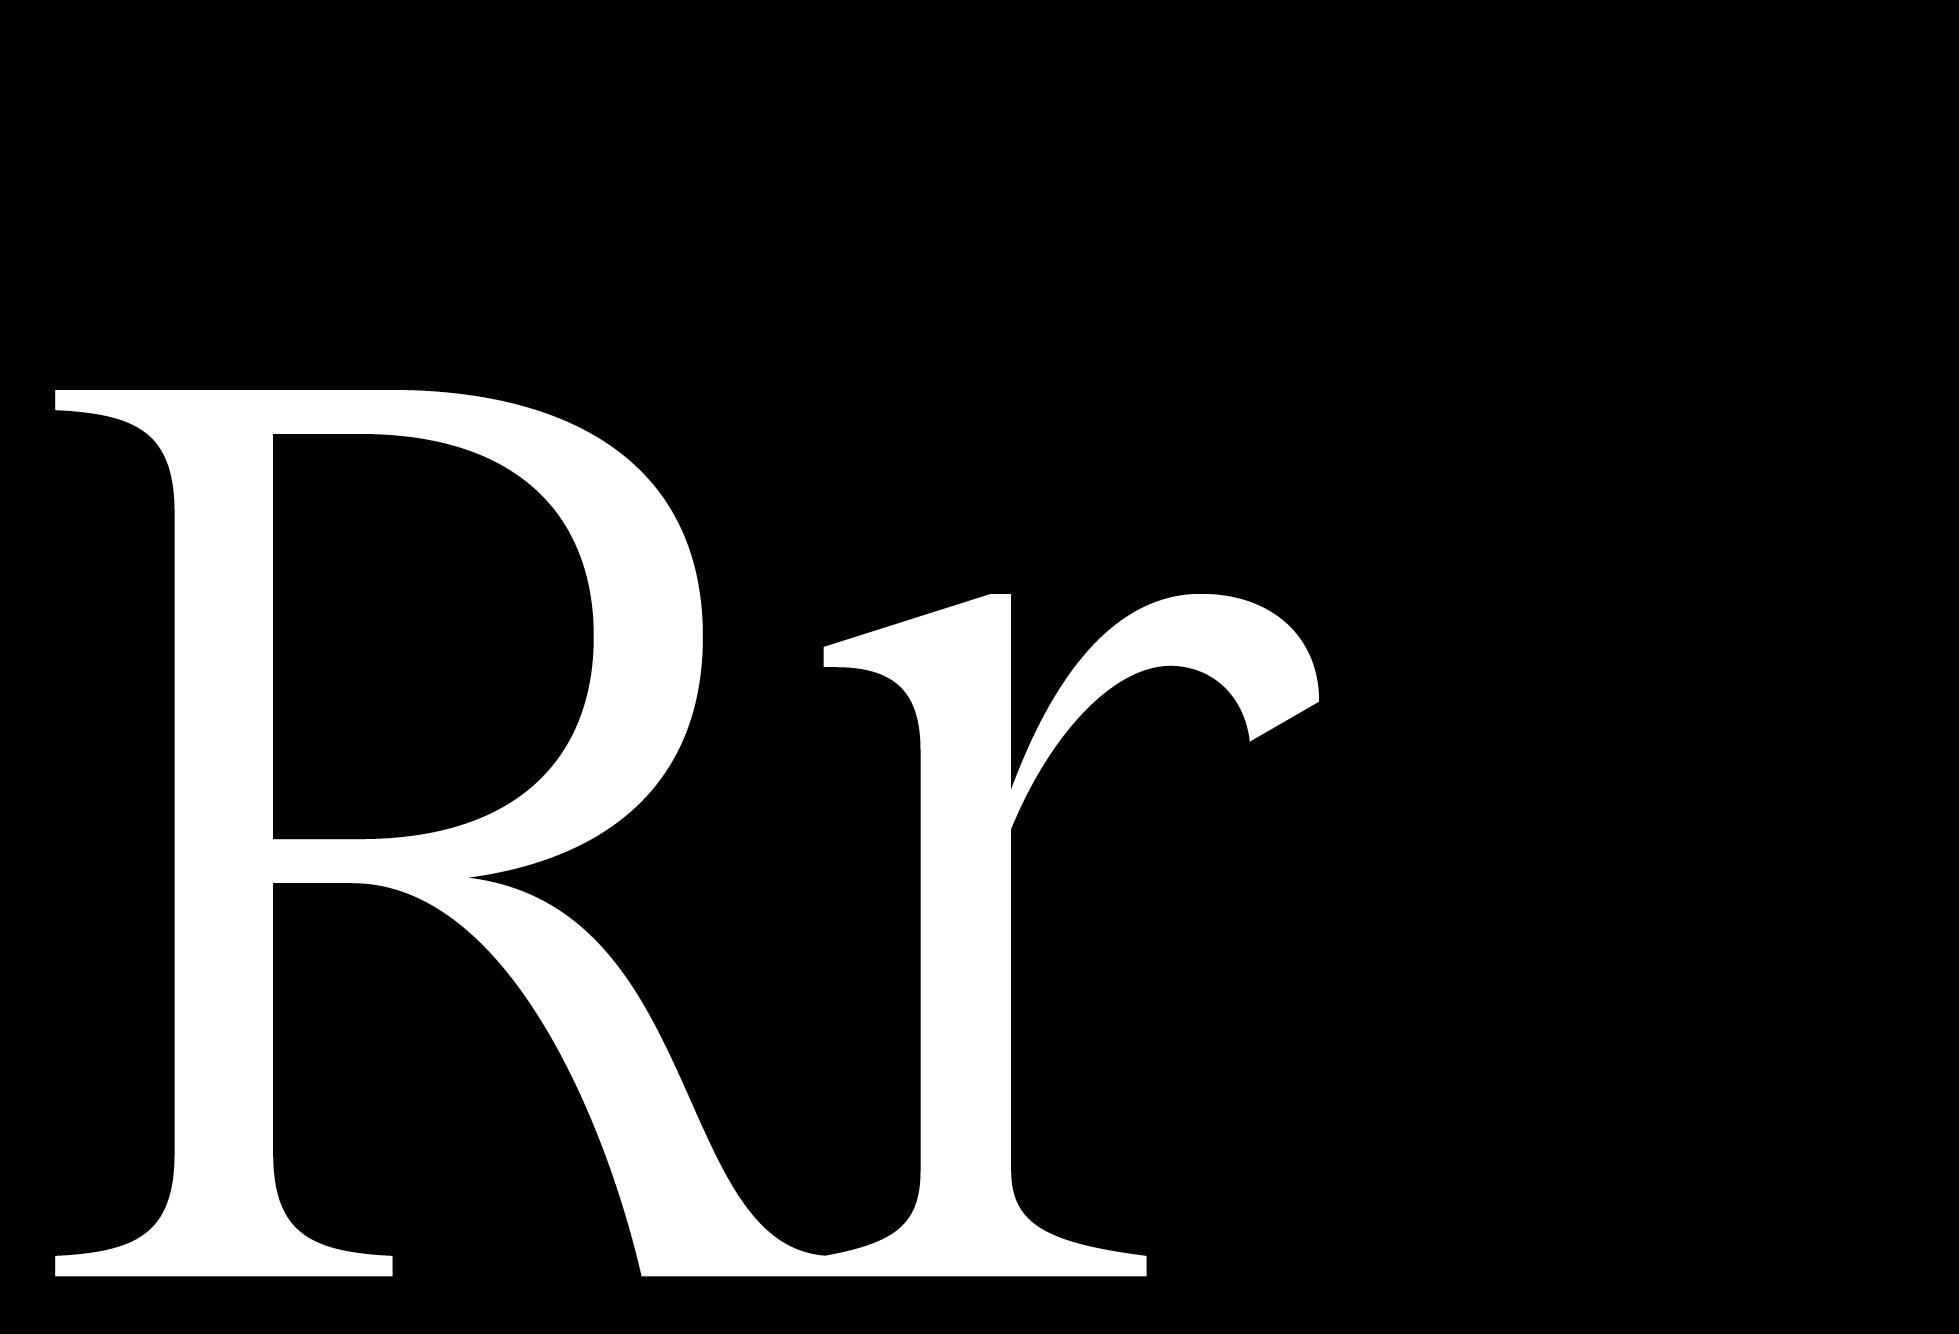 Recklegg (Selected glyphs)